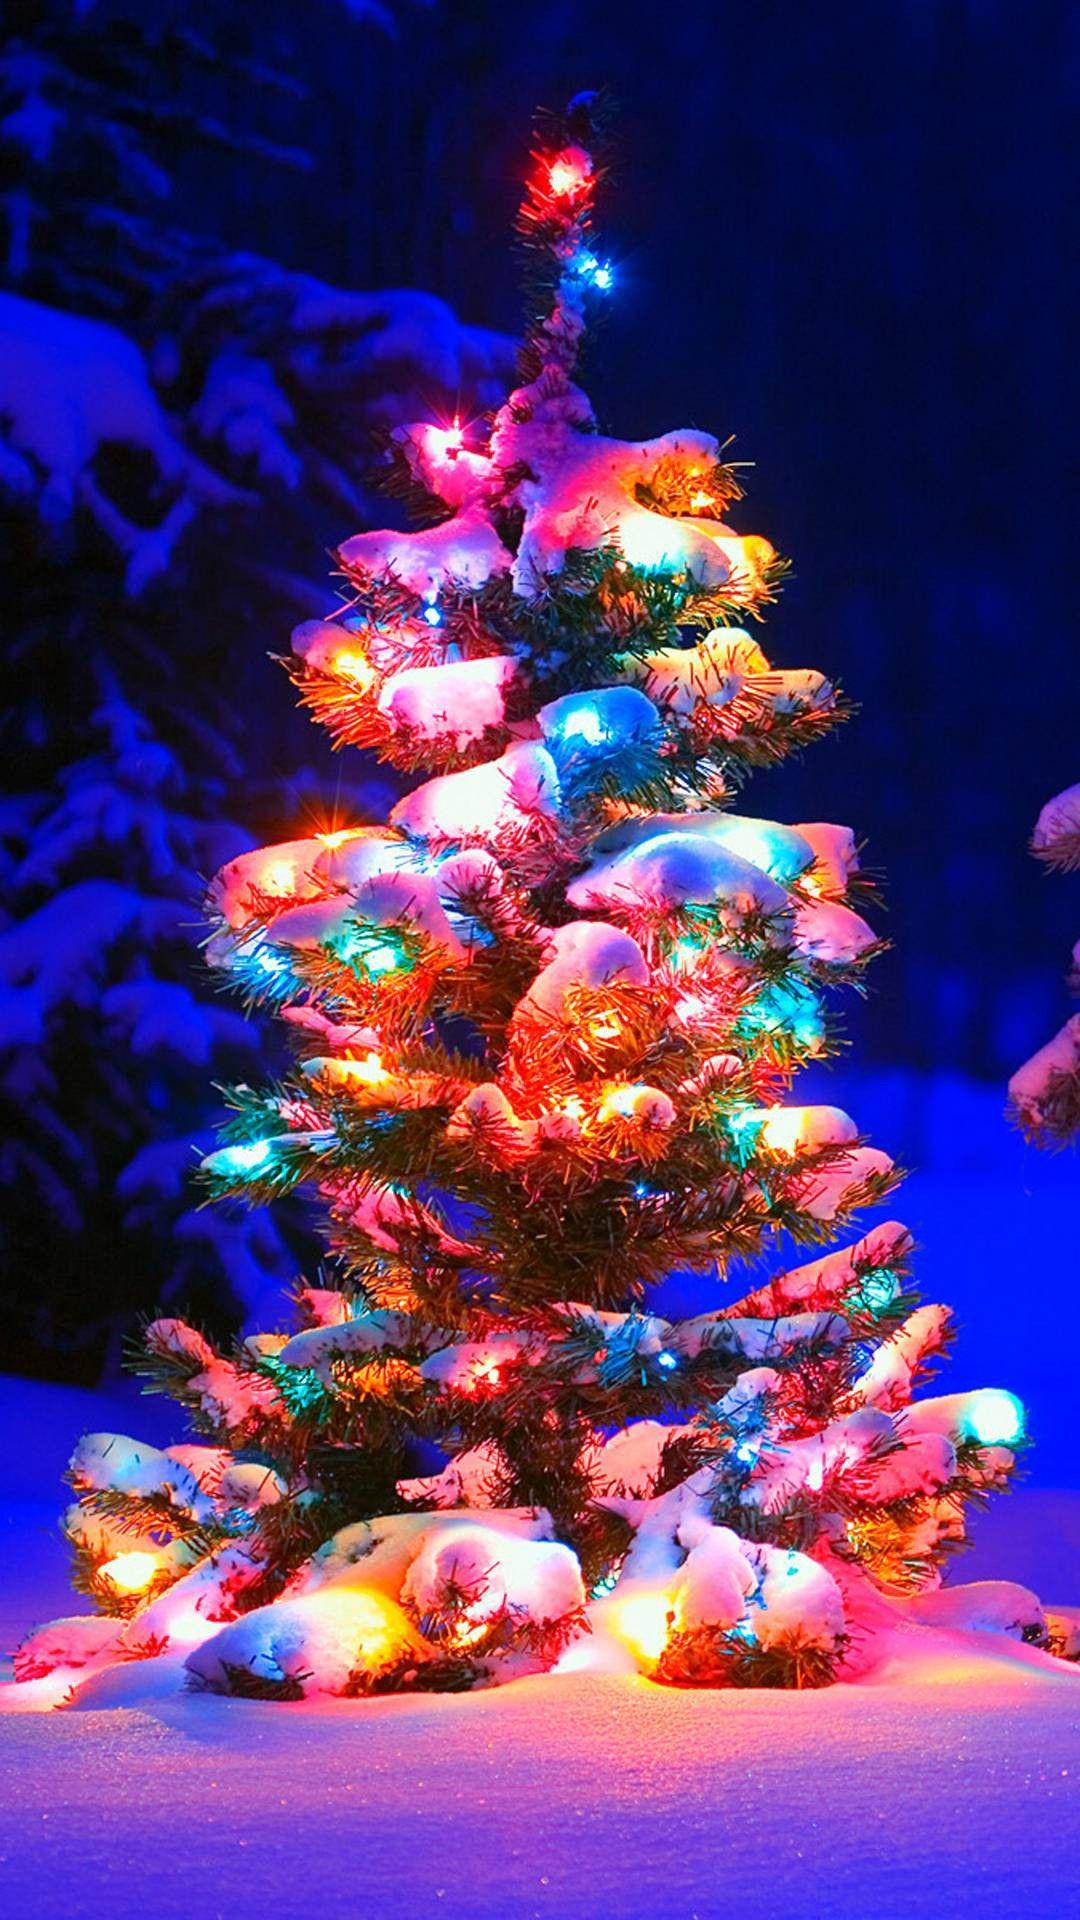 Christmas tree wallpaper christmas phone wallpaper